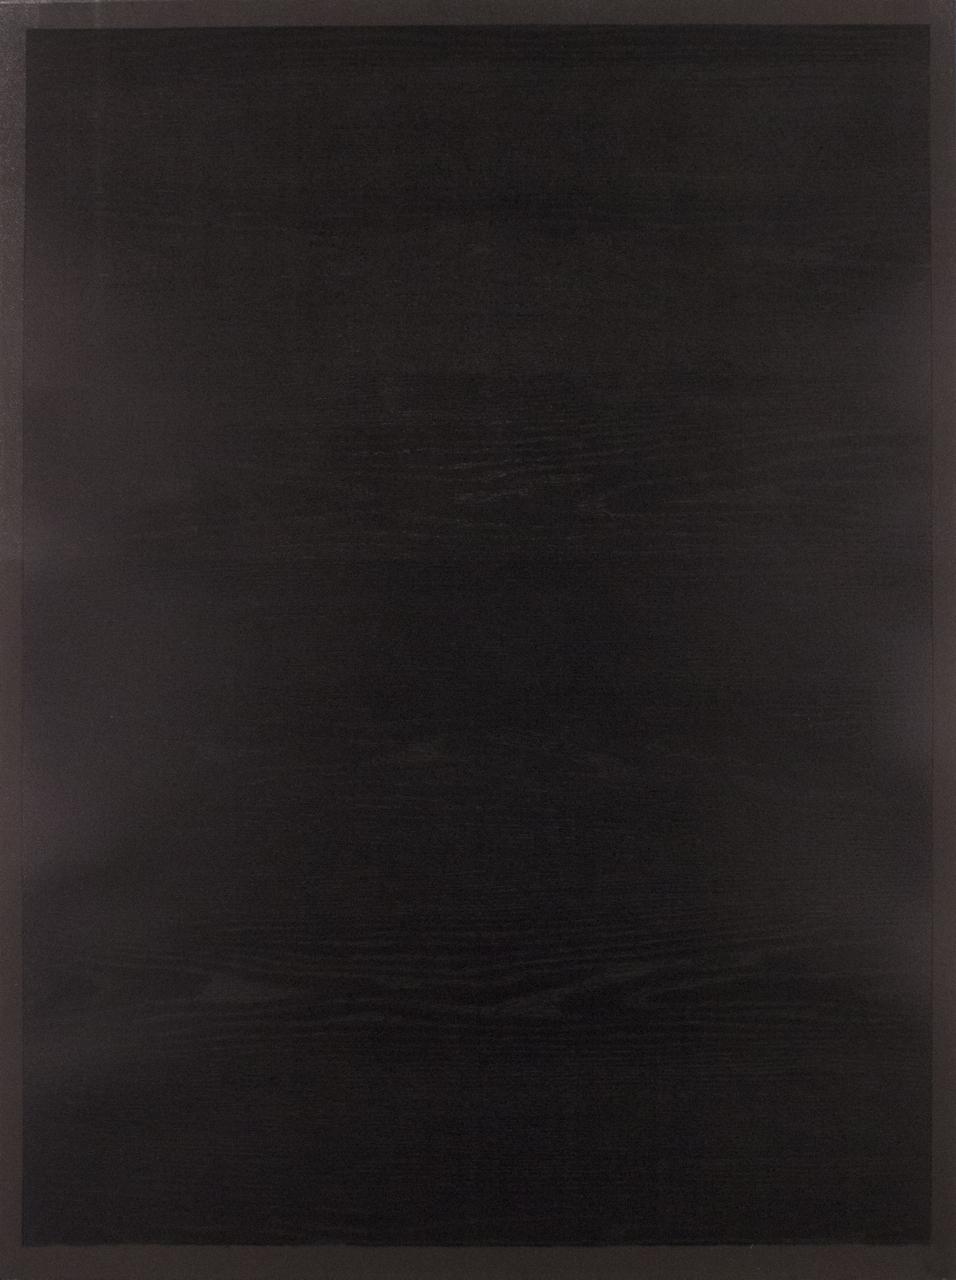 Drawing (Black) large.jpg